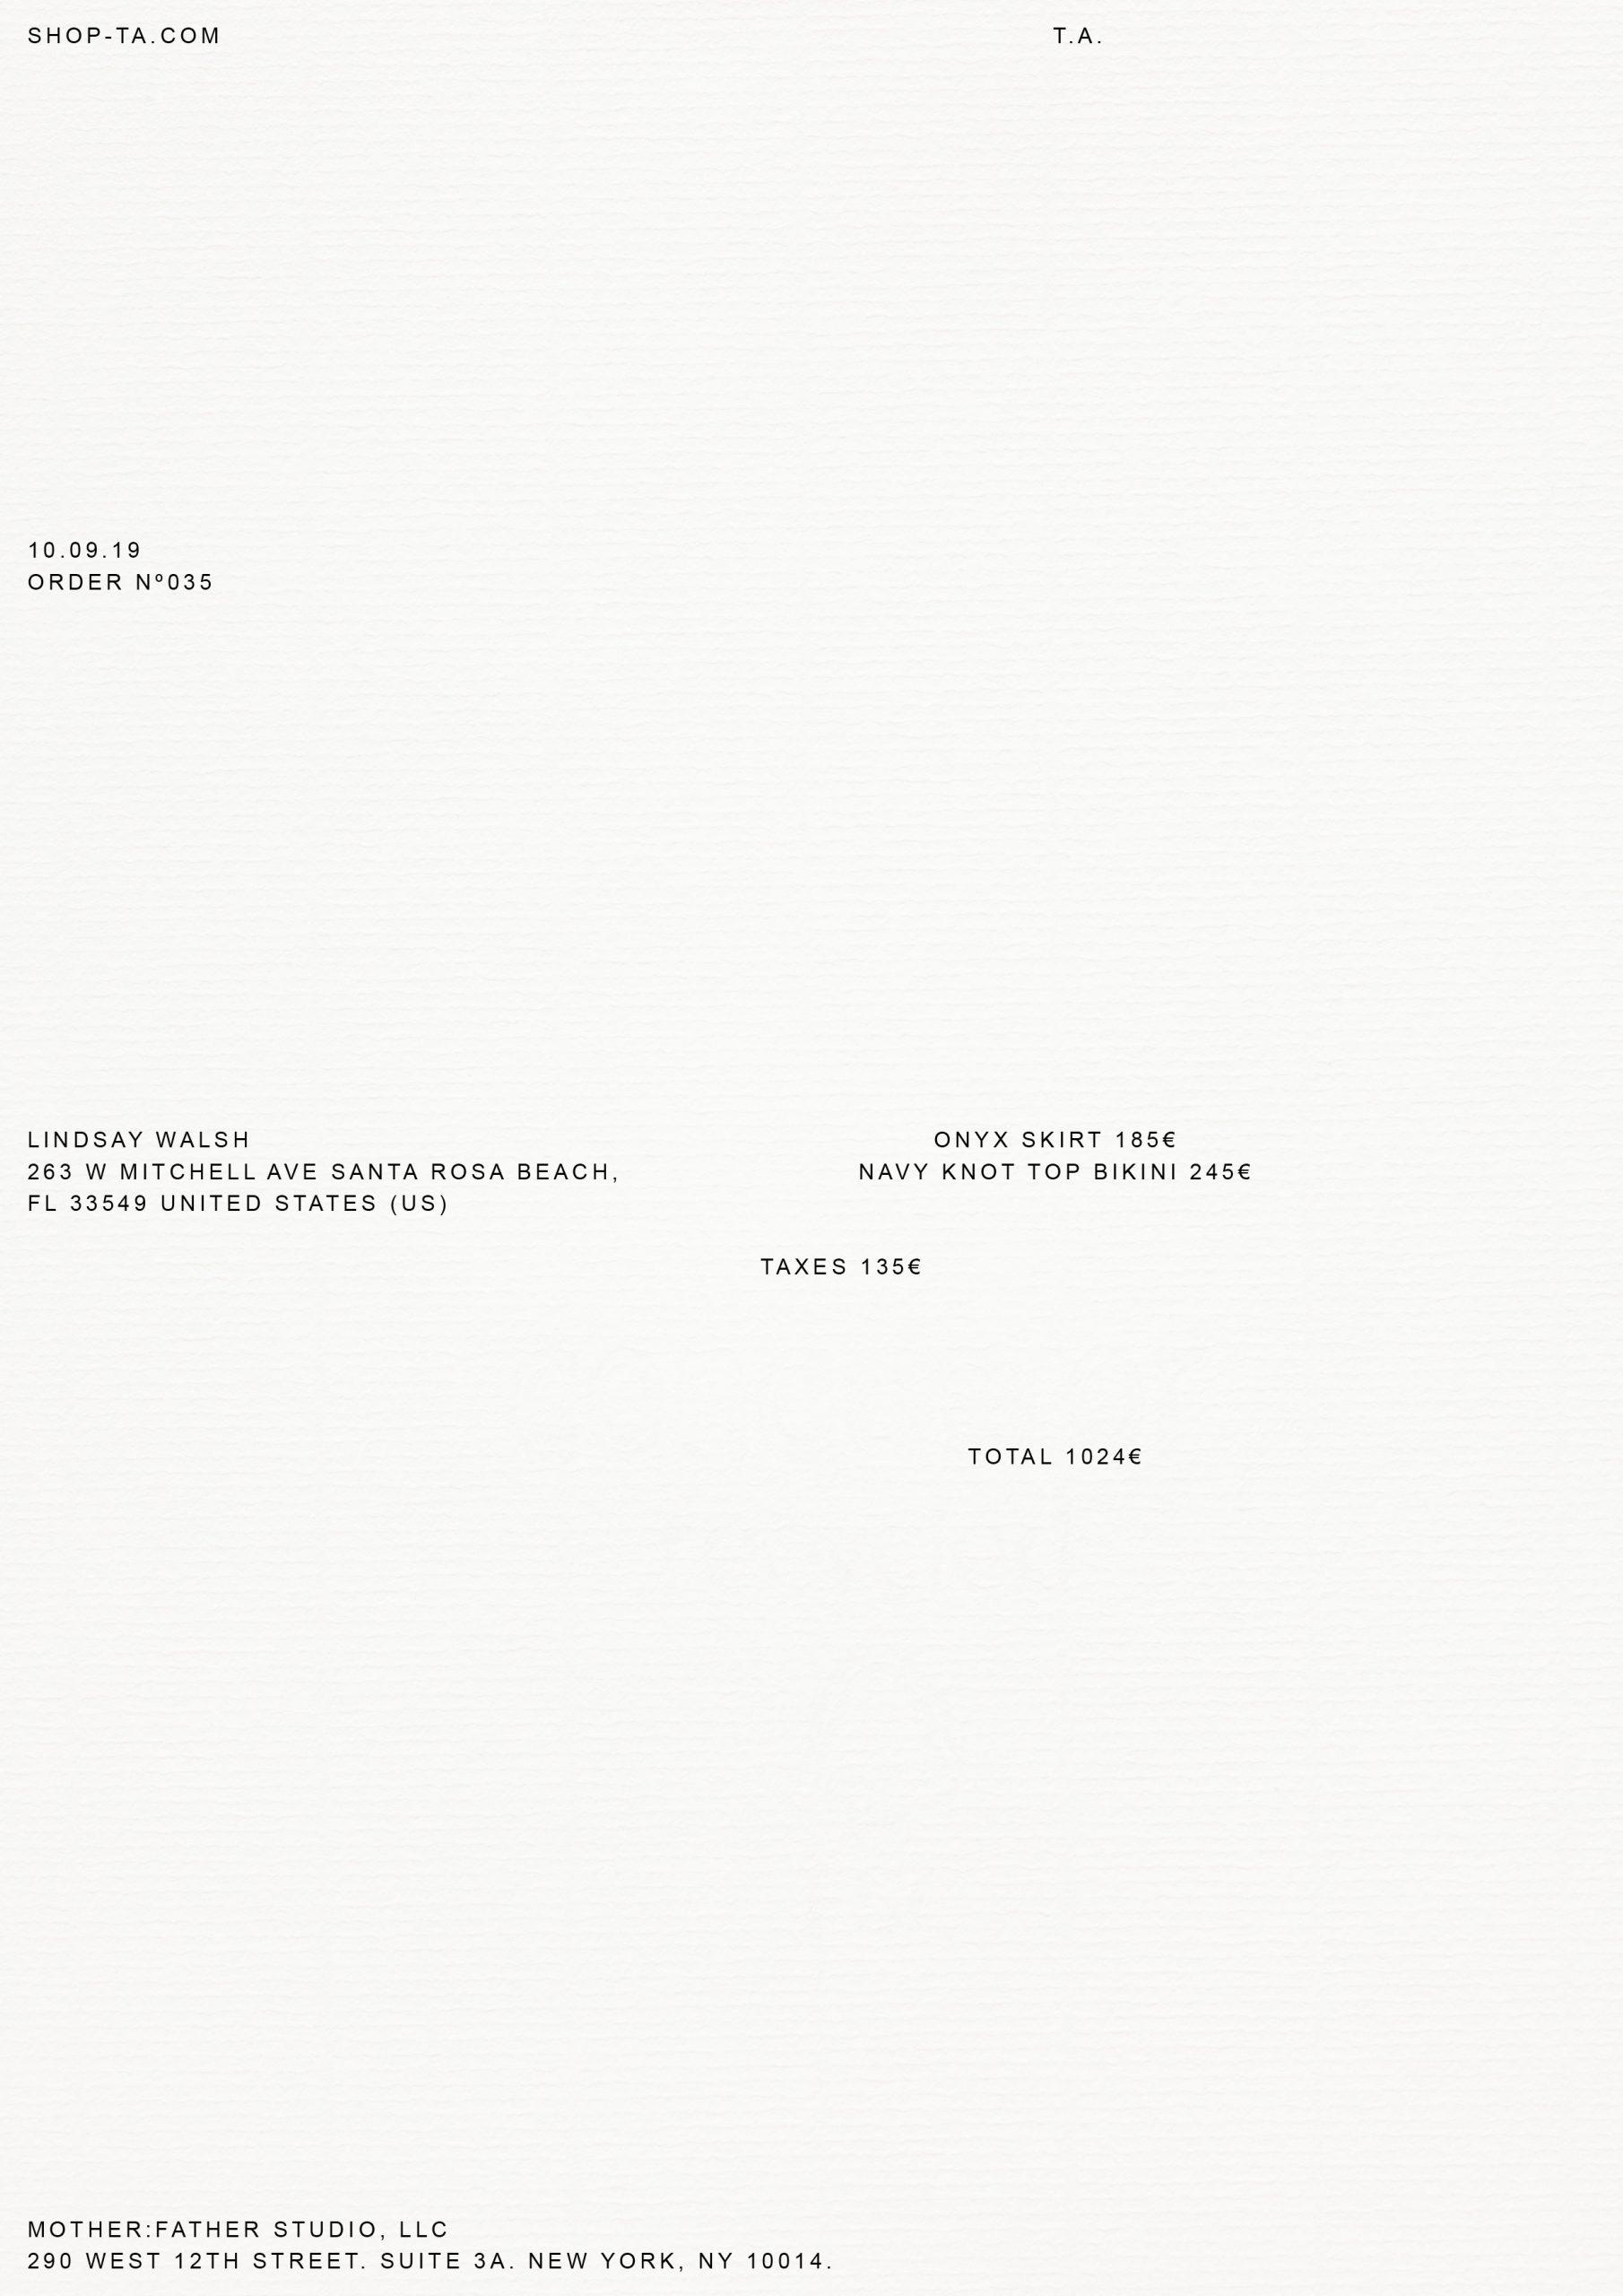 Telsha Anderson Invoice - Cárter Studio